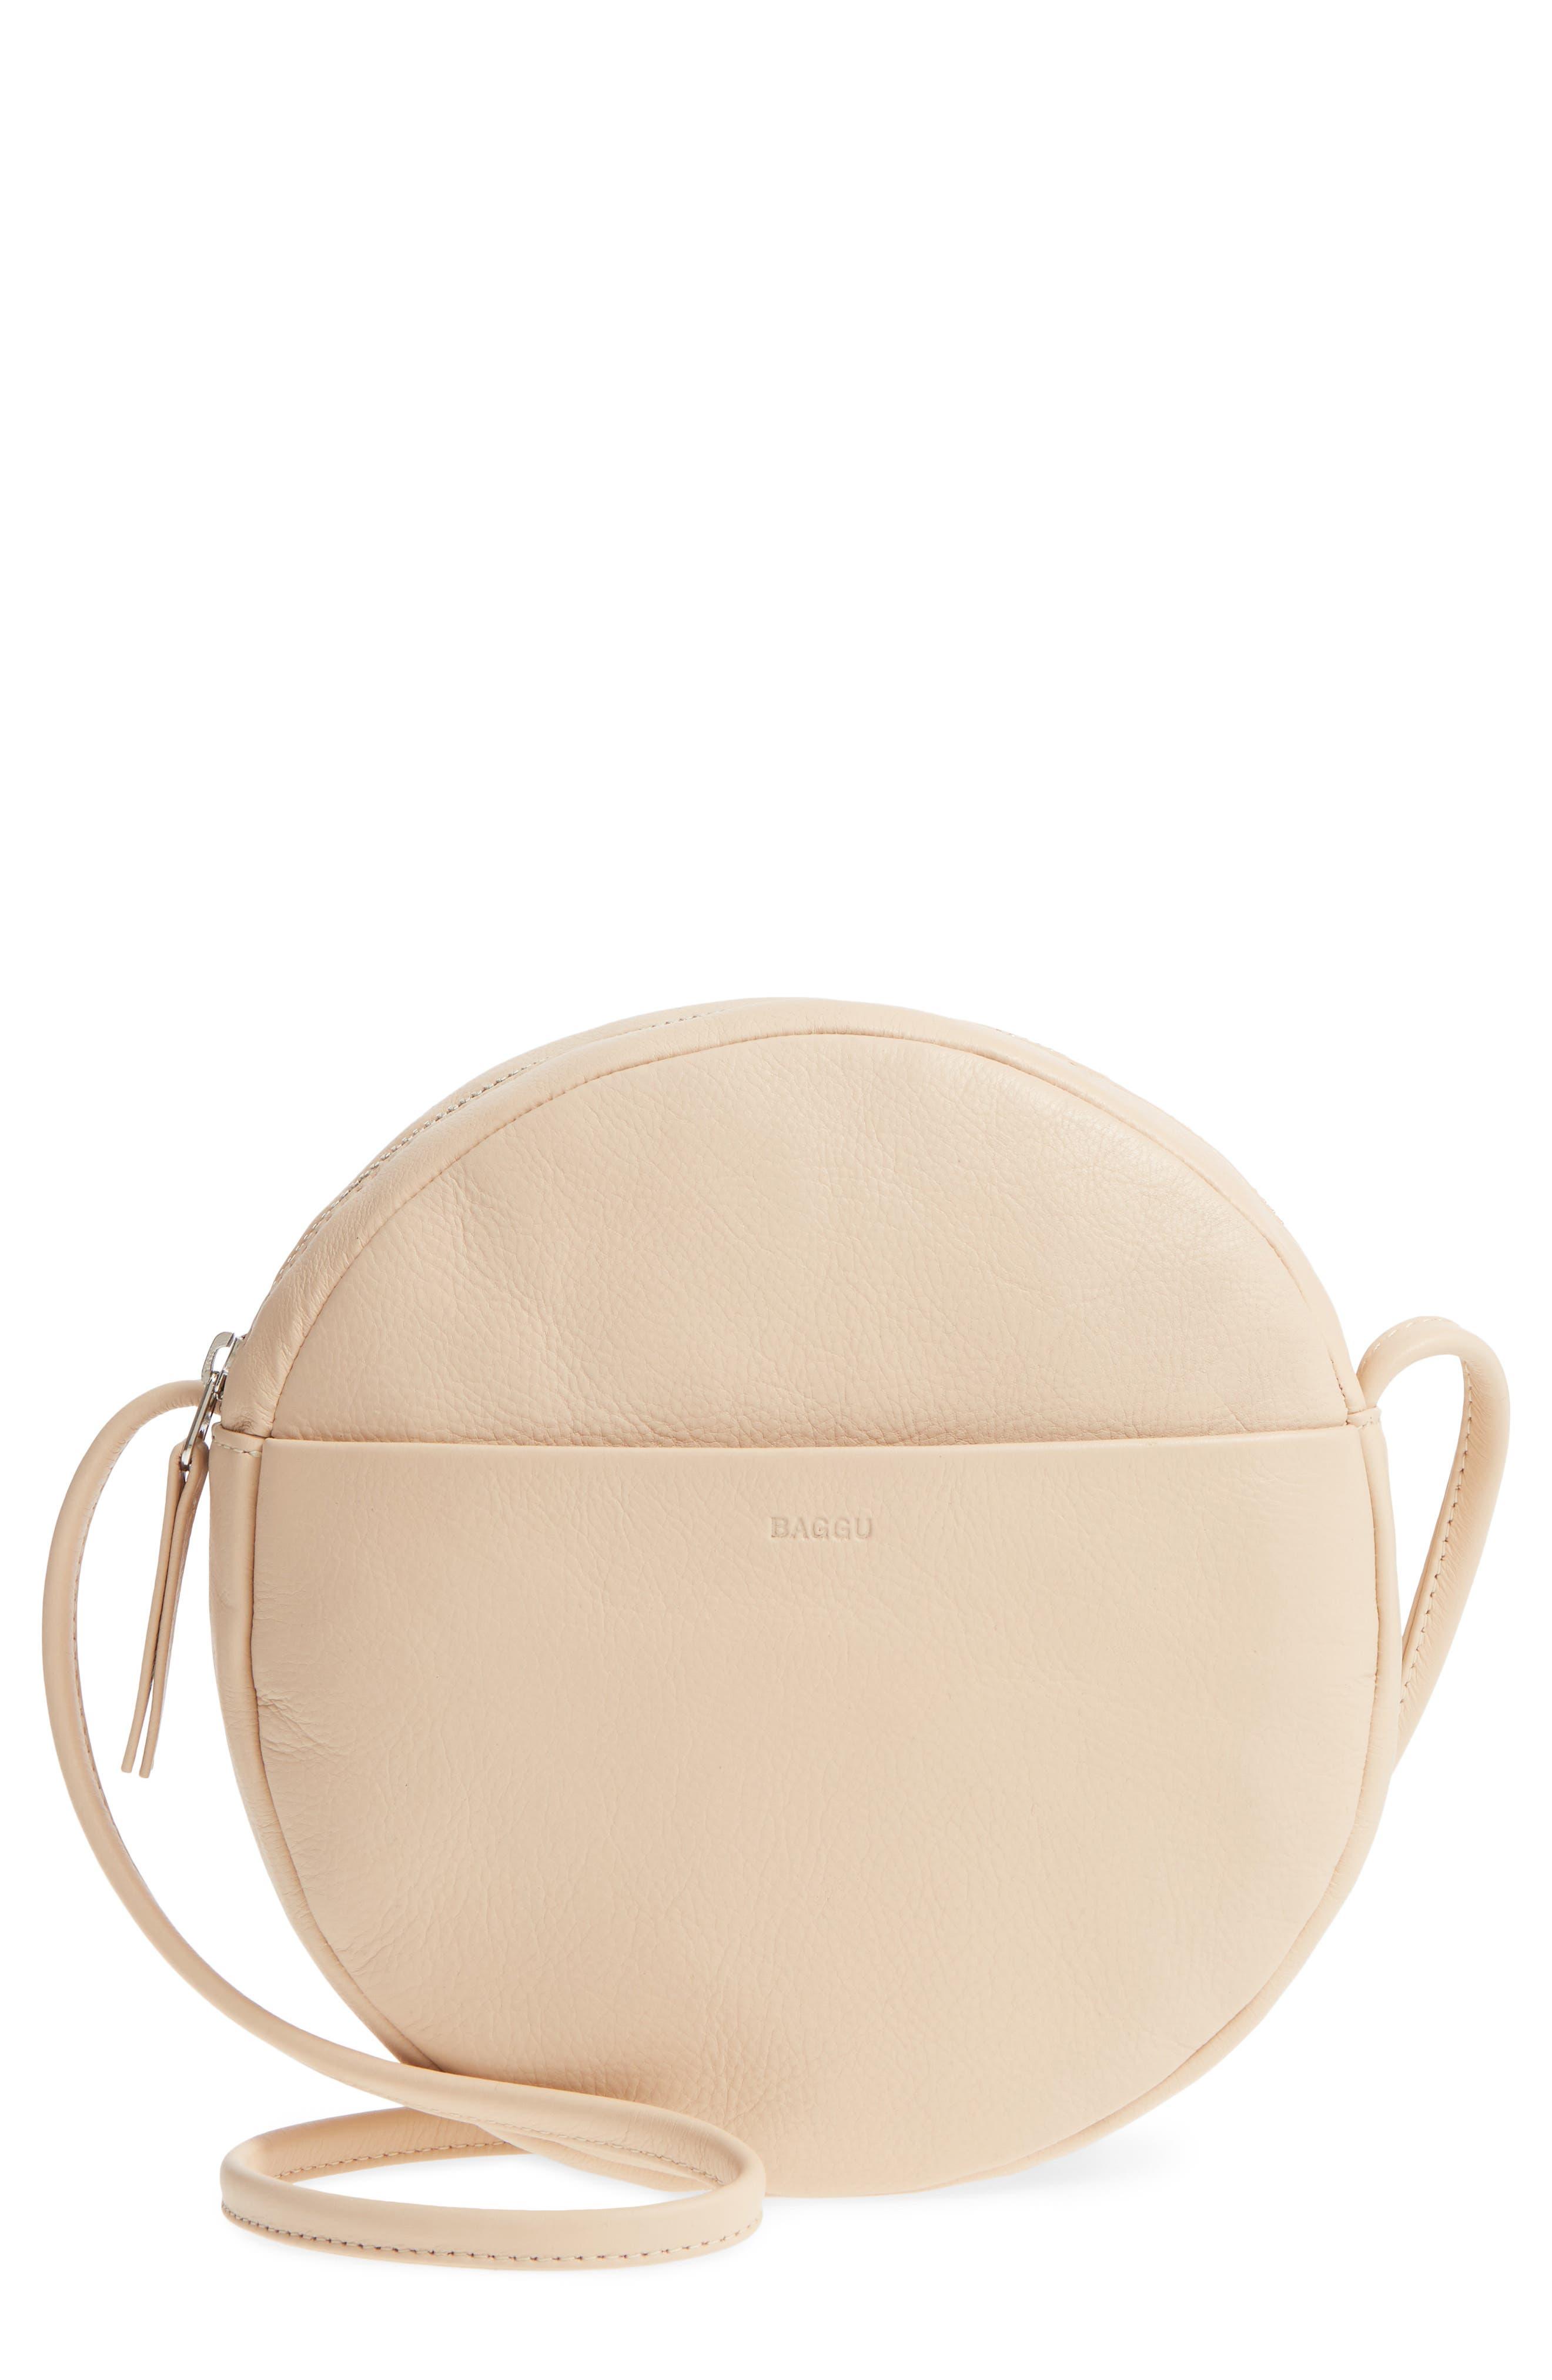 Baggu Circle Calfskin Leather Crossbody Bag